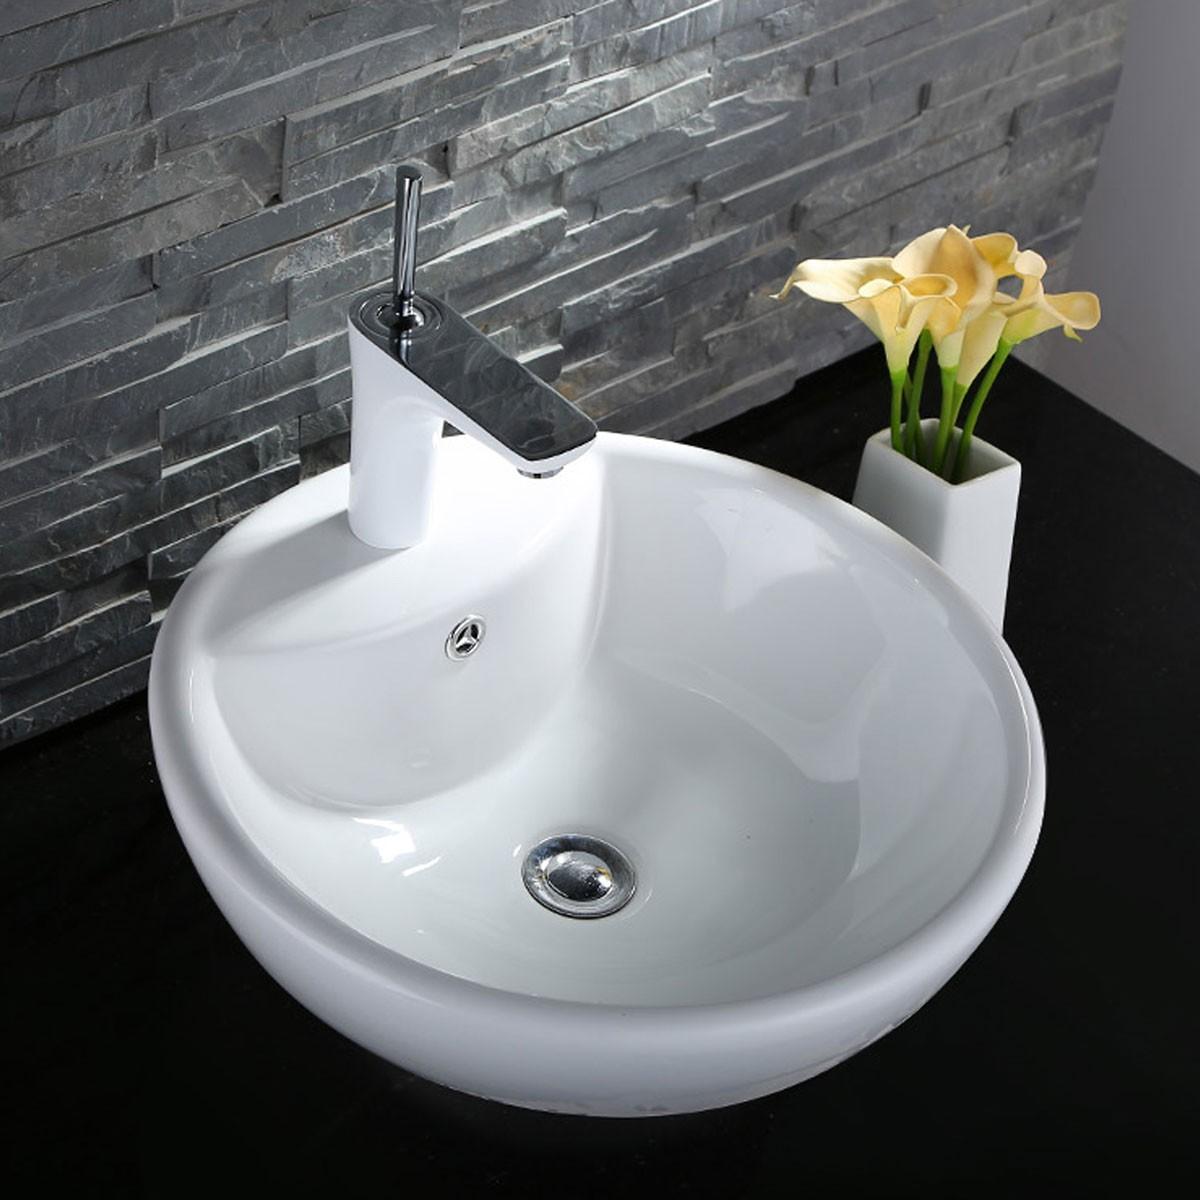 Decoraport White Round Ceramic Above Counter Vessel Sink (CL-1042)